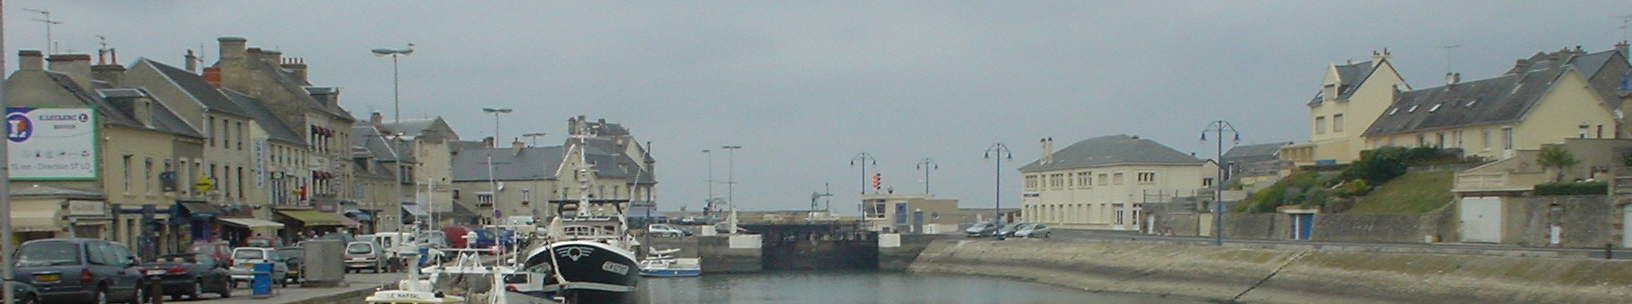 Bessin Harbour